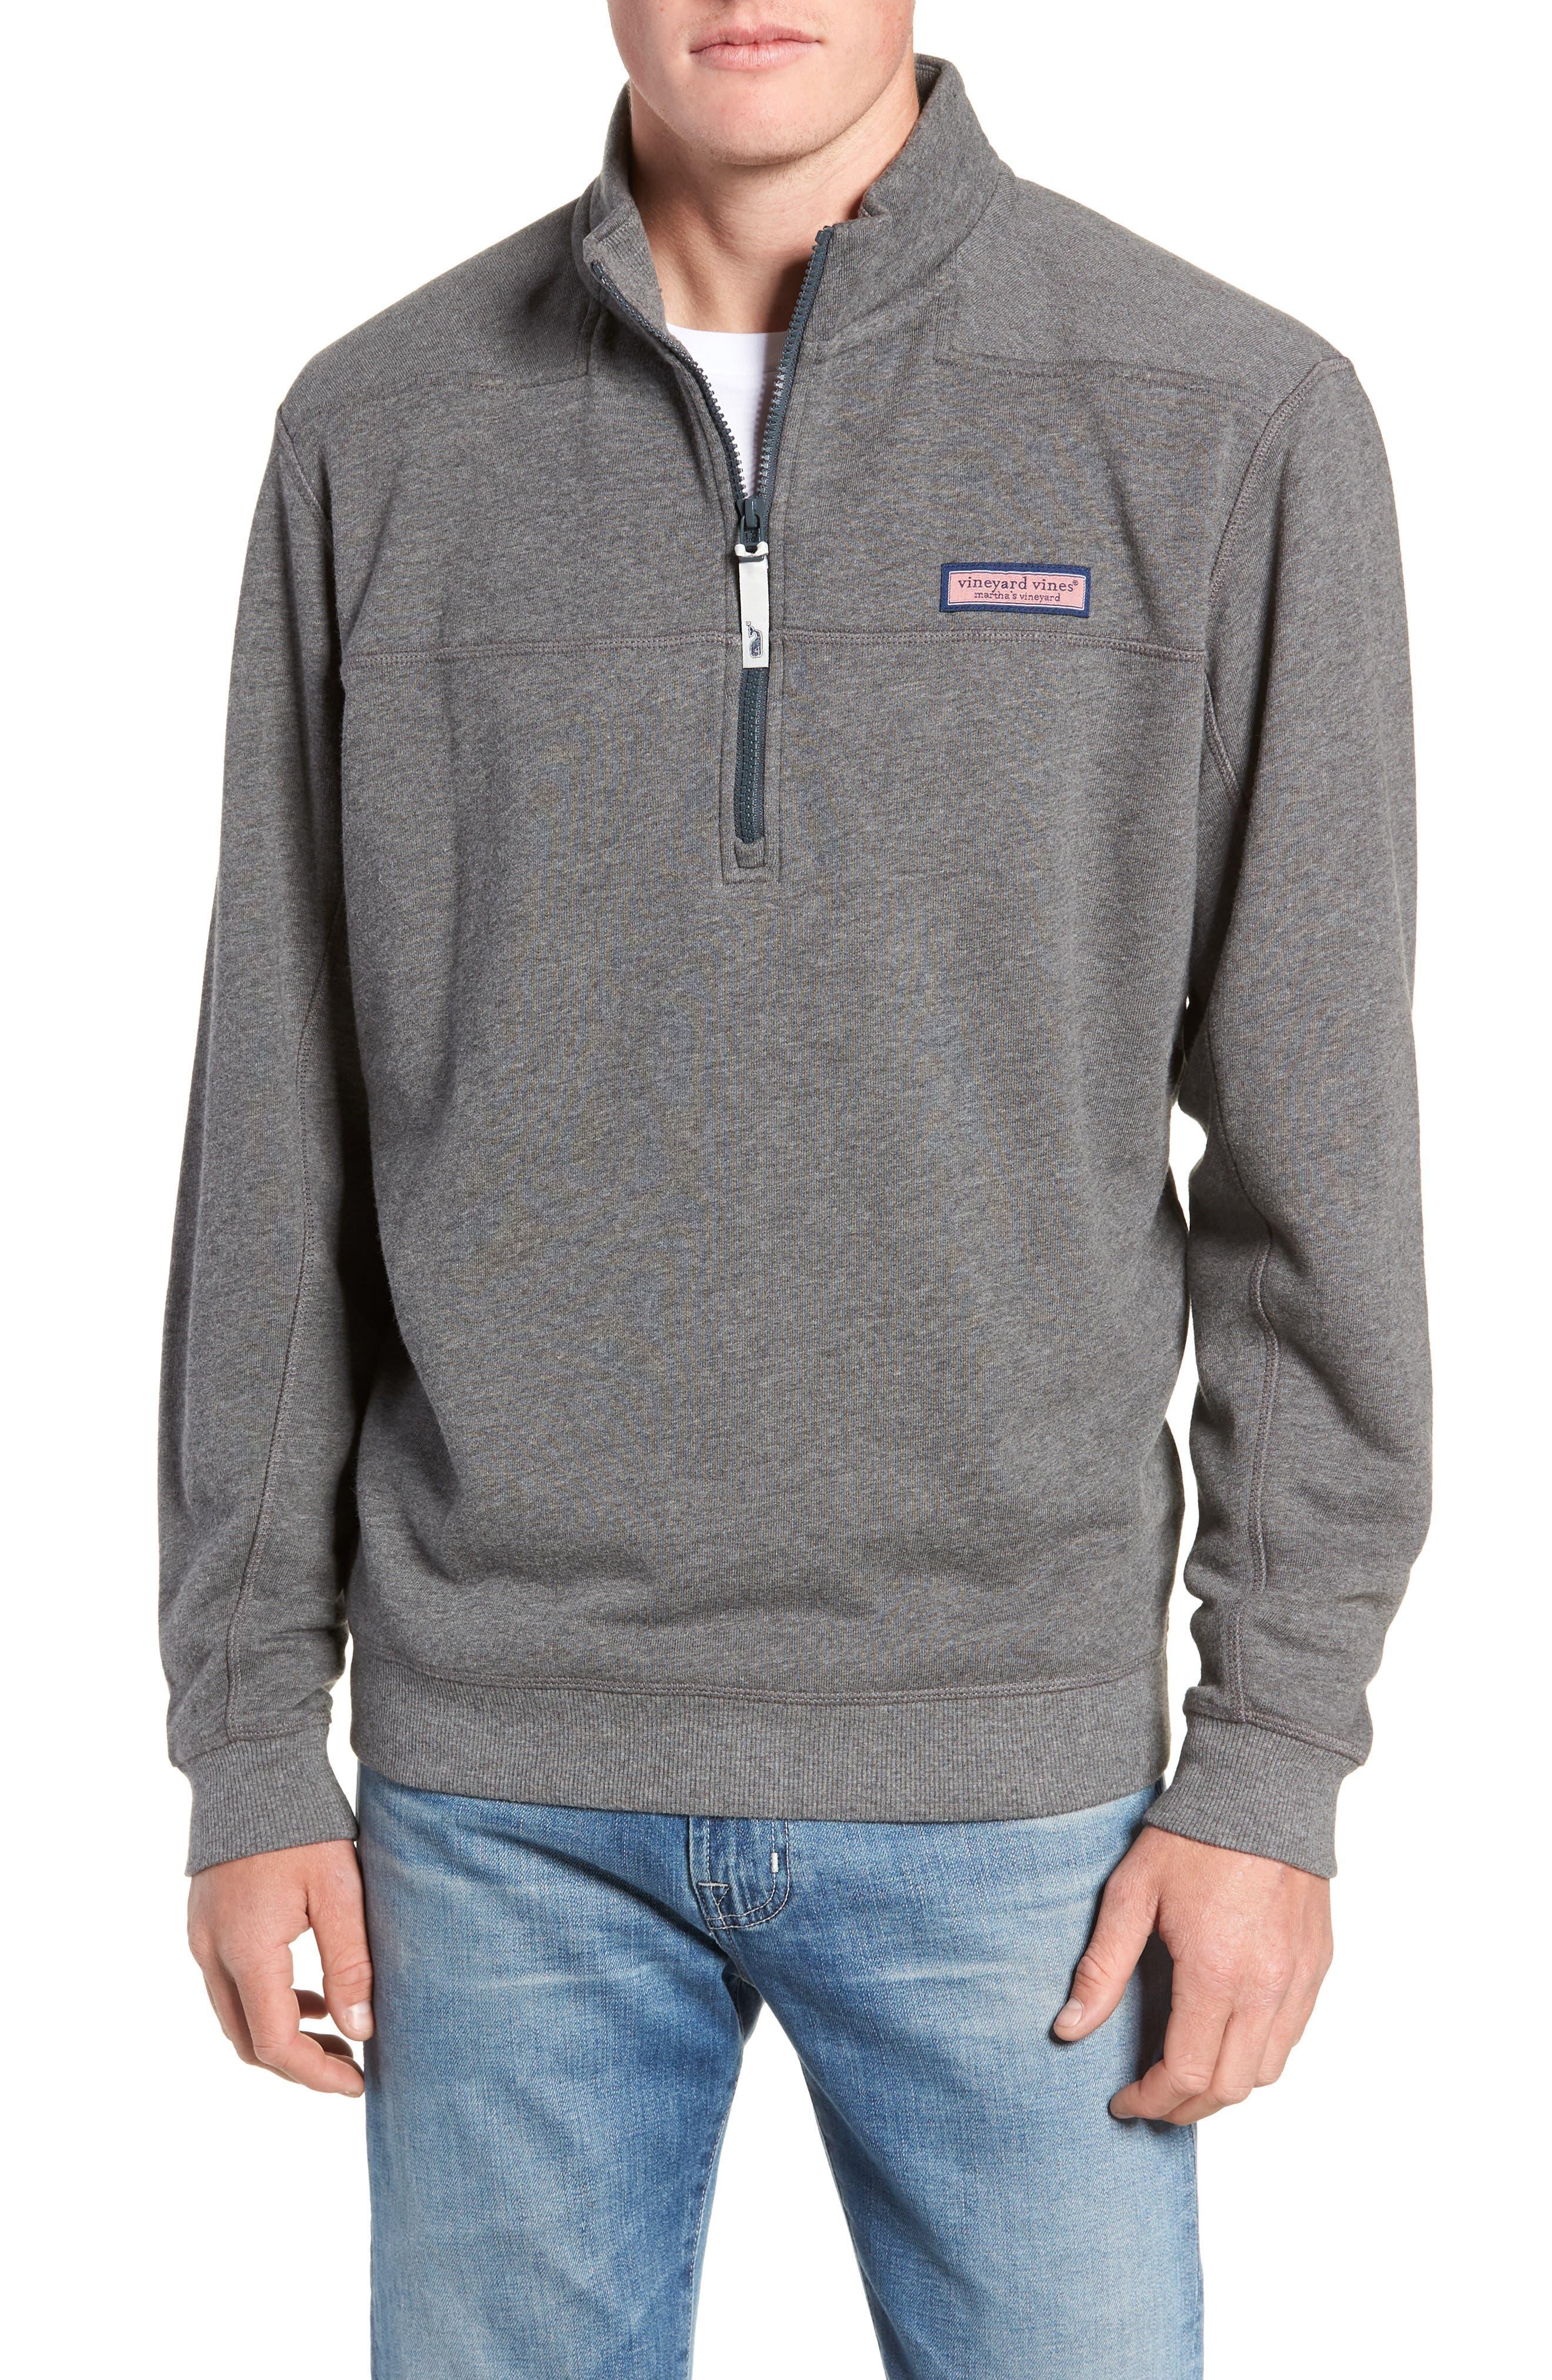 VINEYARD VINES Collegiate Half Zip Pullover, Main, color, 023